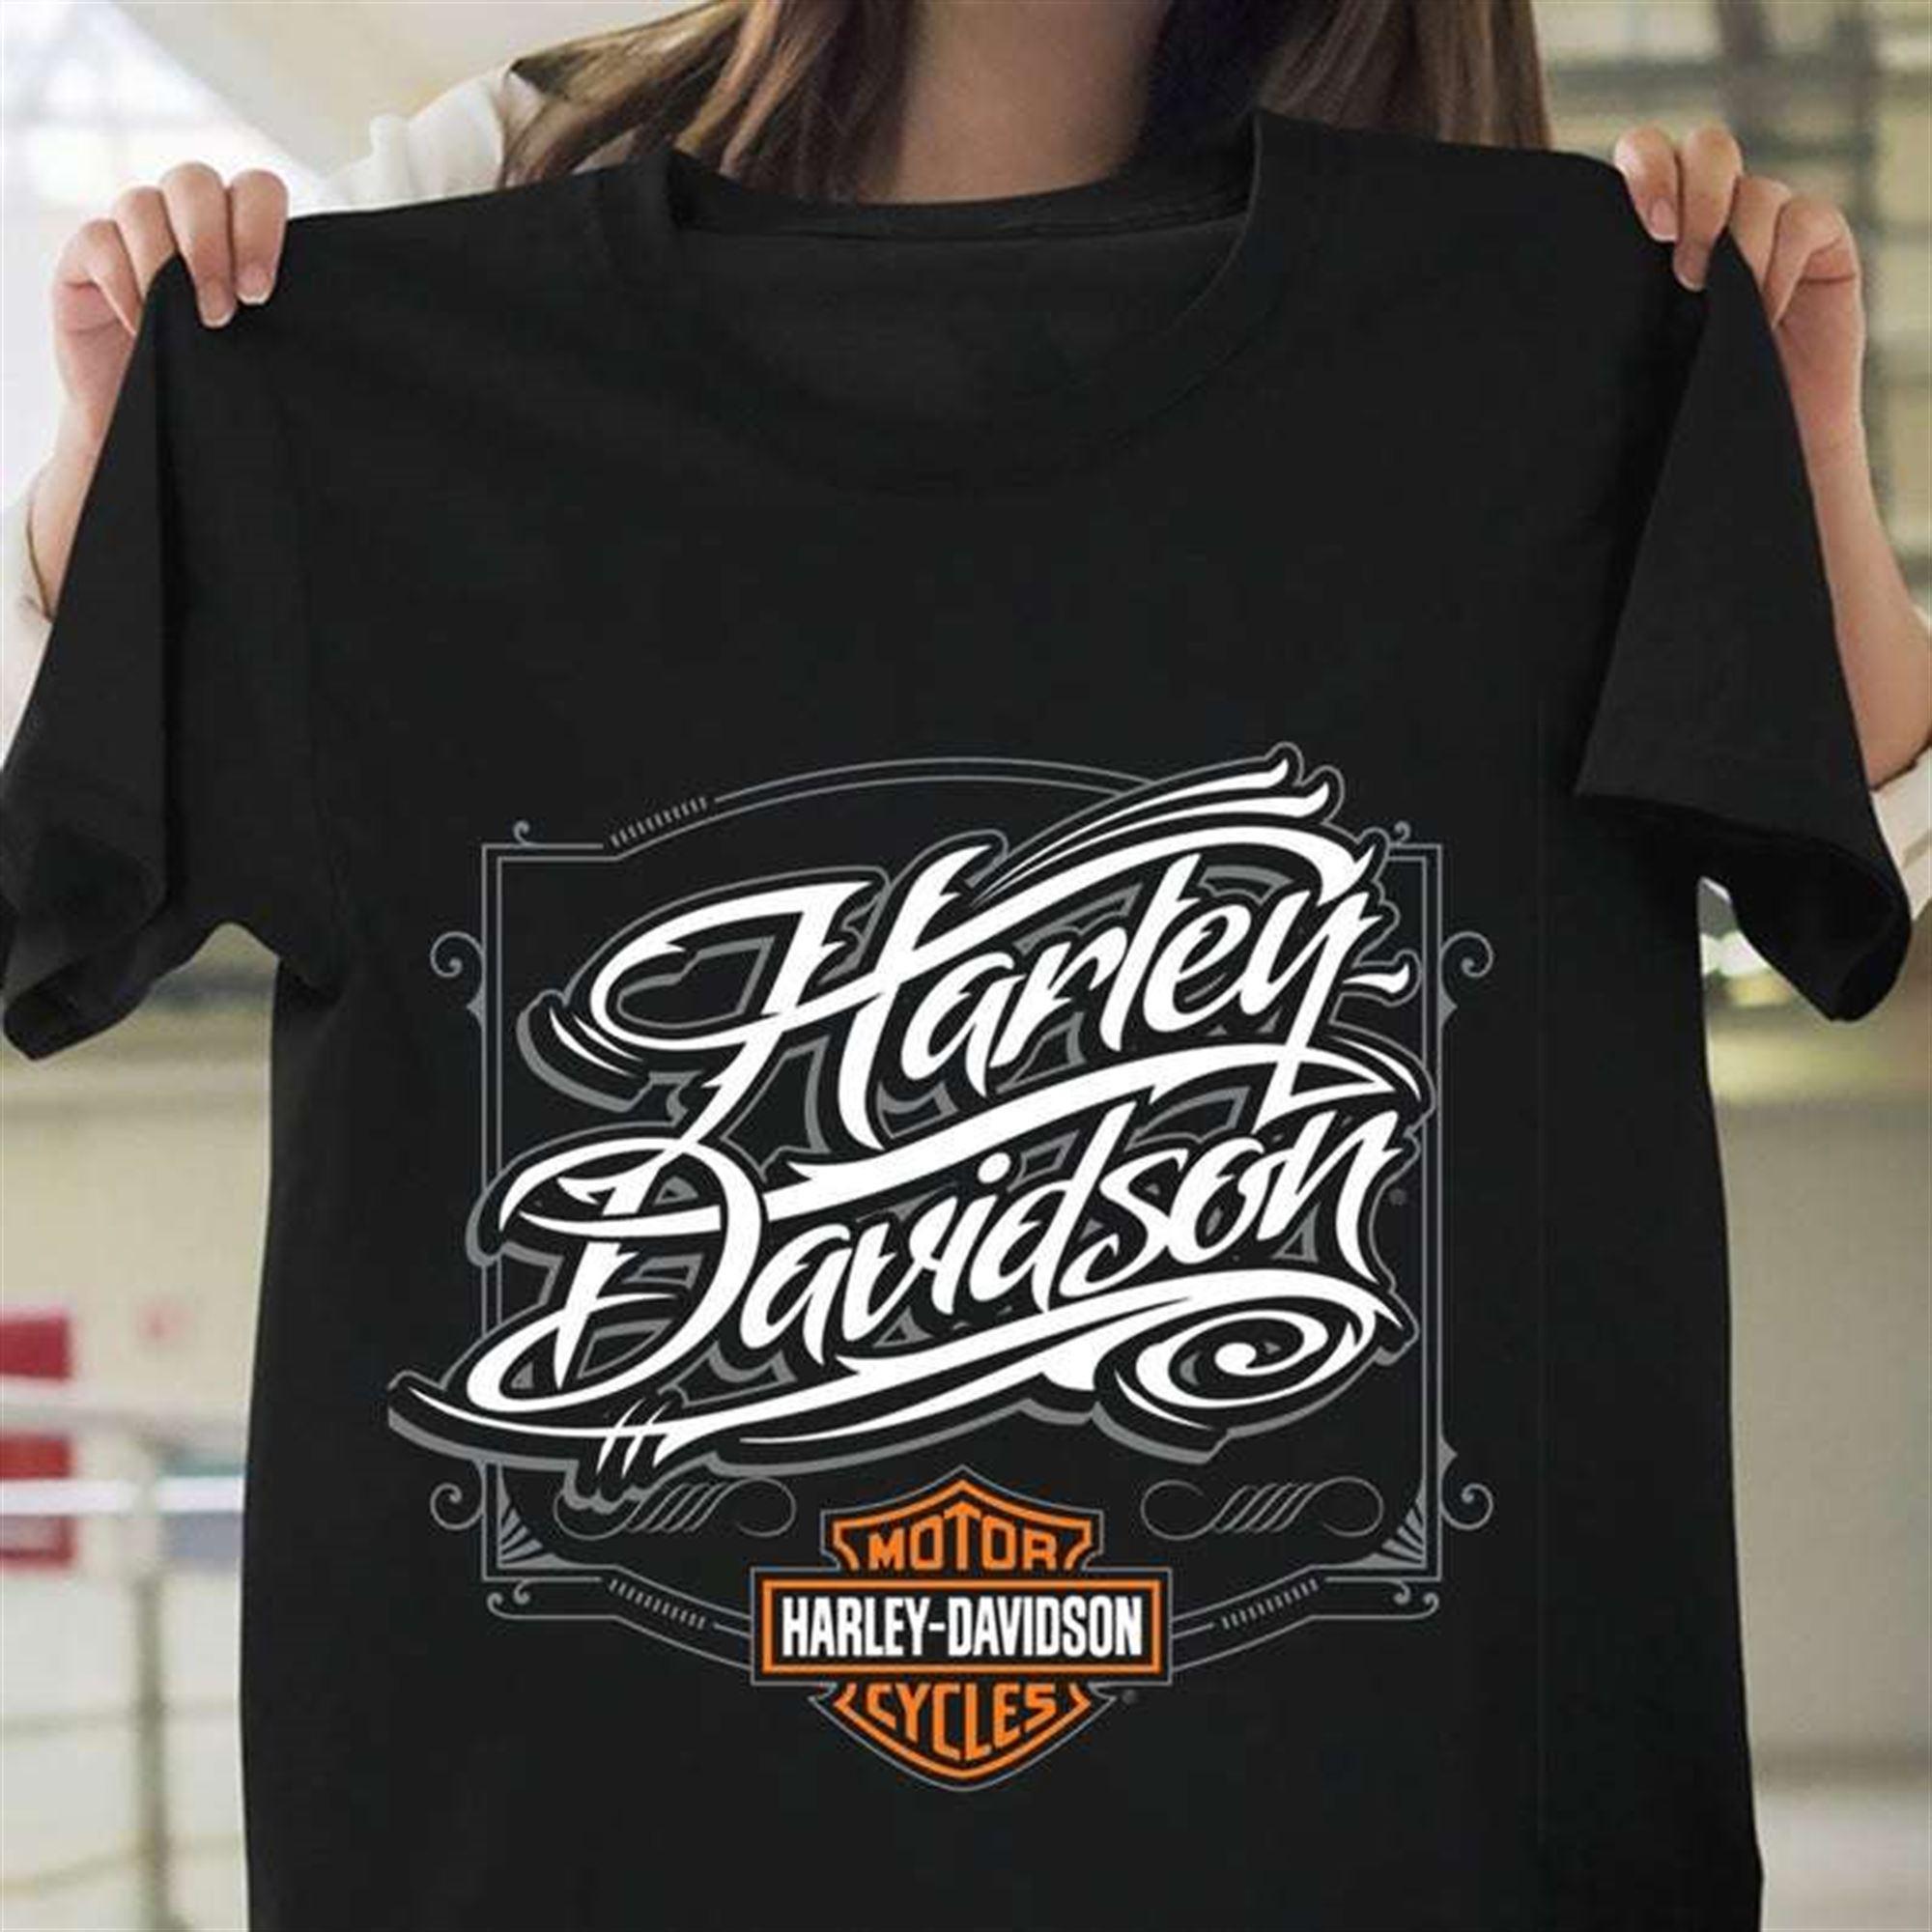 Vintage Harley Davidson T-shirt Size Up To 5xl